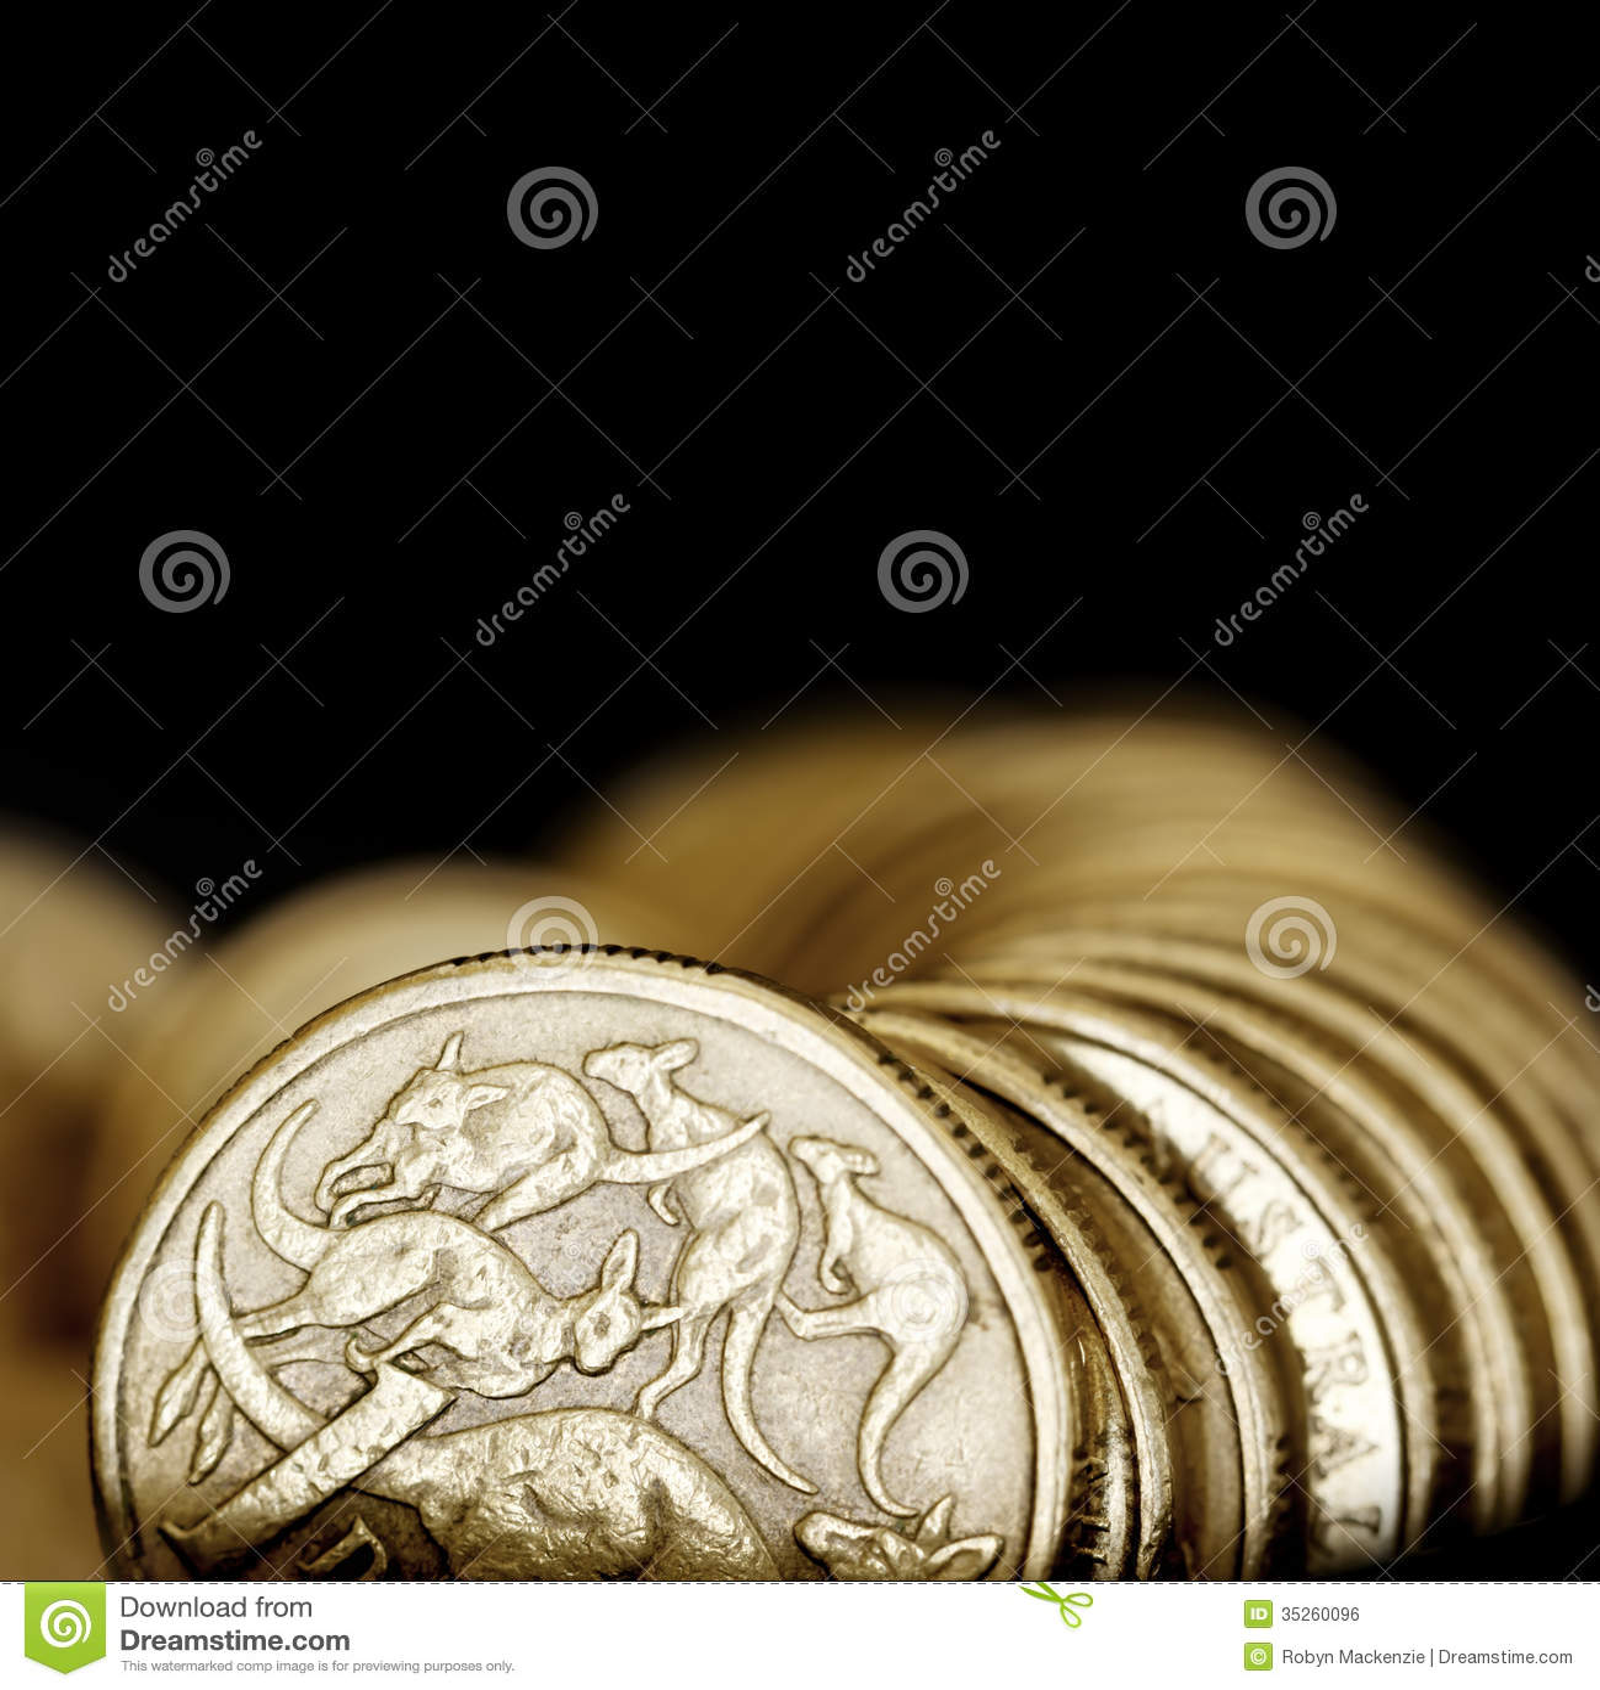 Australian One Dollar Coins over Black